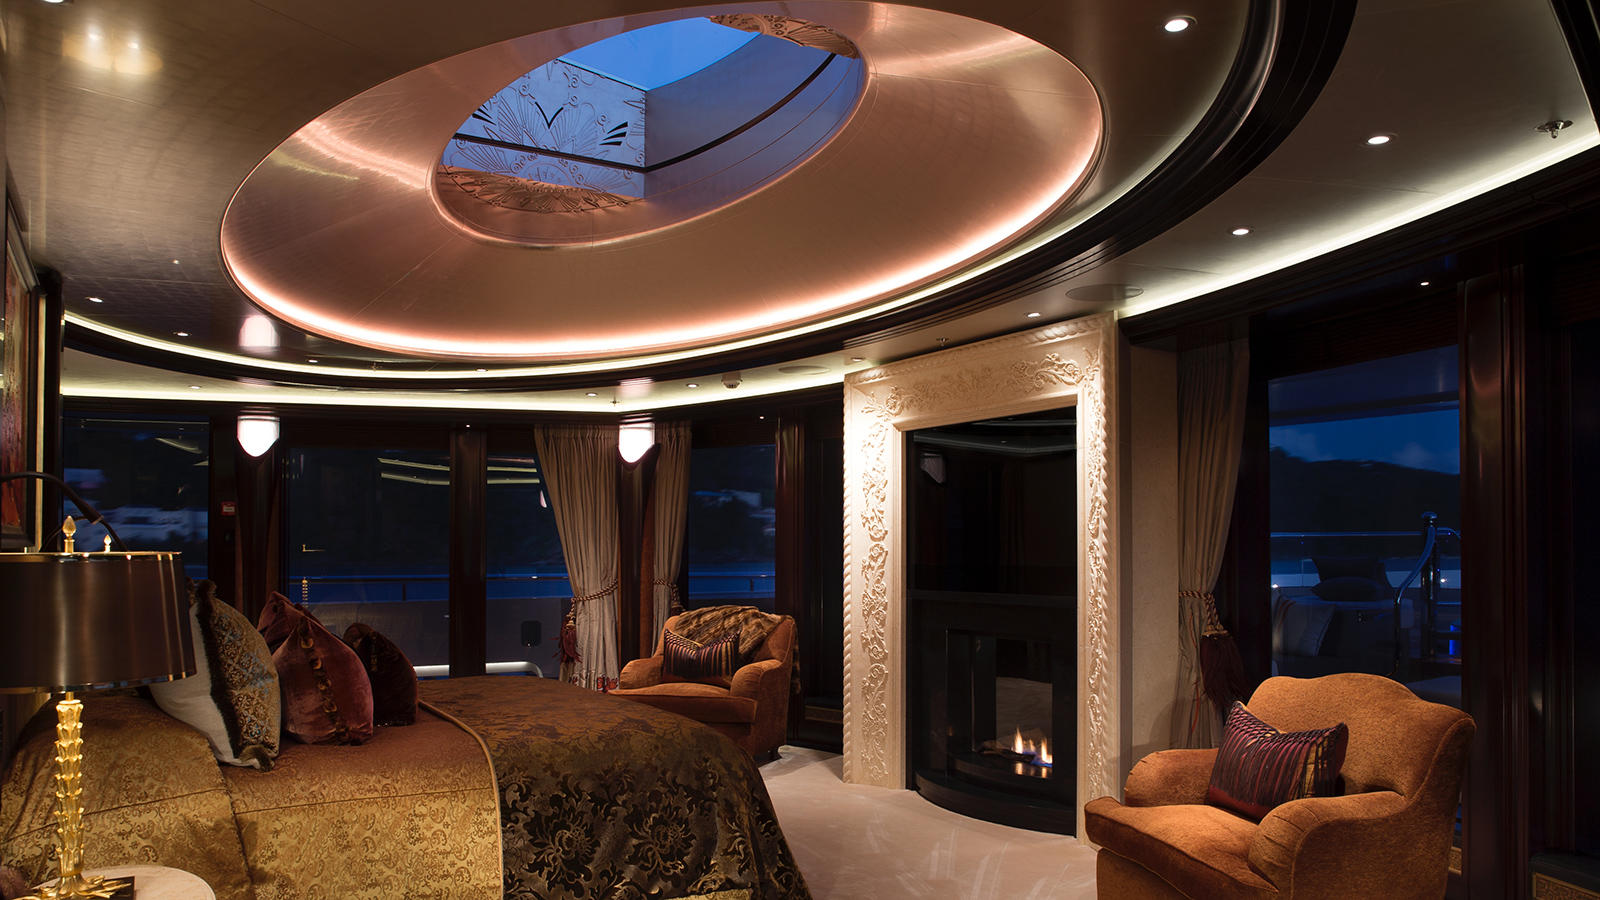 mJMEZVaYRcmew7GjzosJ_Kismet-super-yacht-lurssen-shahid-khan-95-metres-credit-guillaume-plisson-cabin